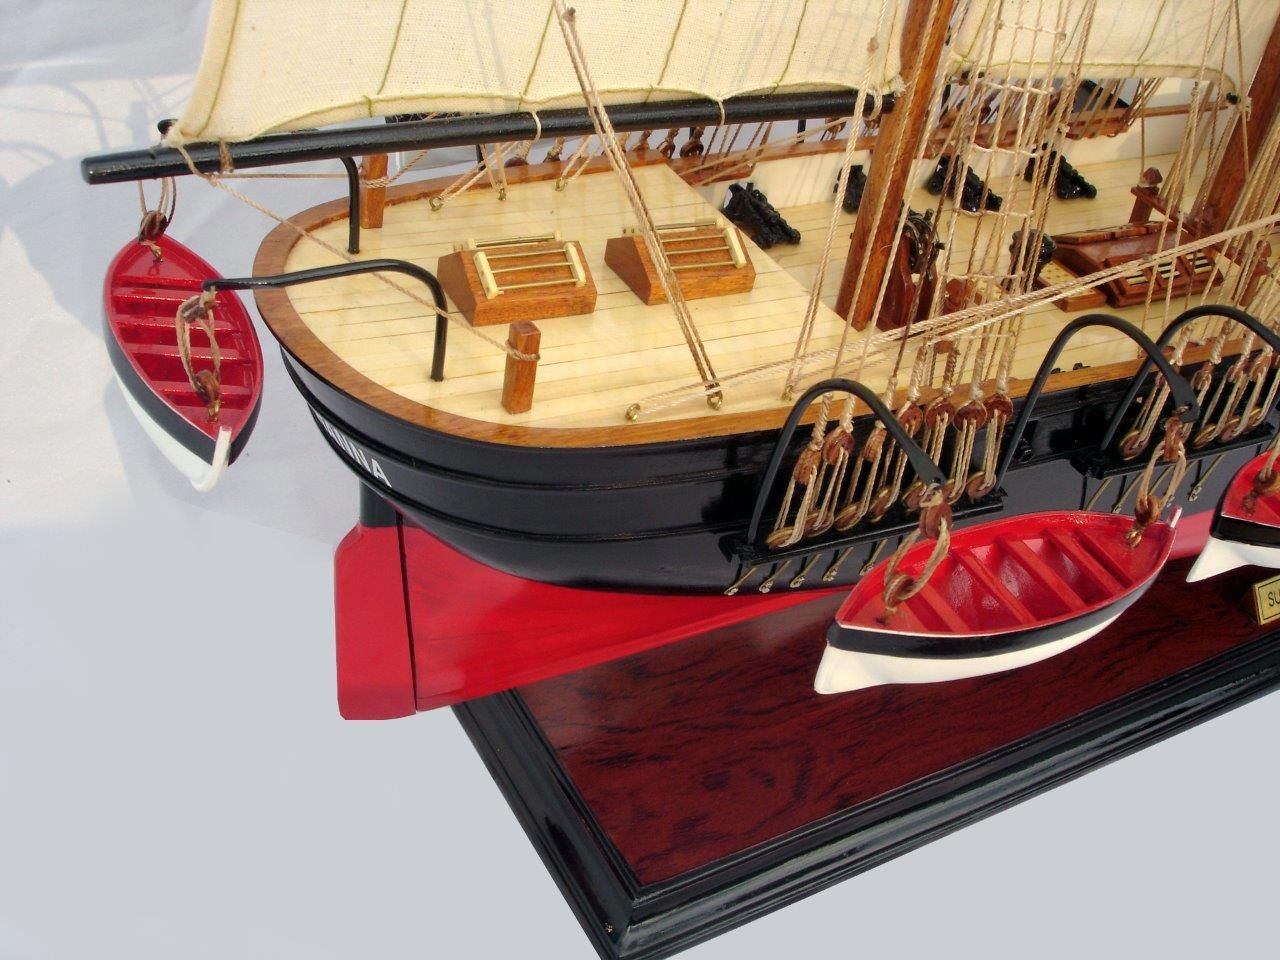 2098-12478-USS-Susquehanna-Model-Boat